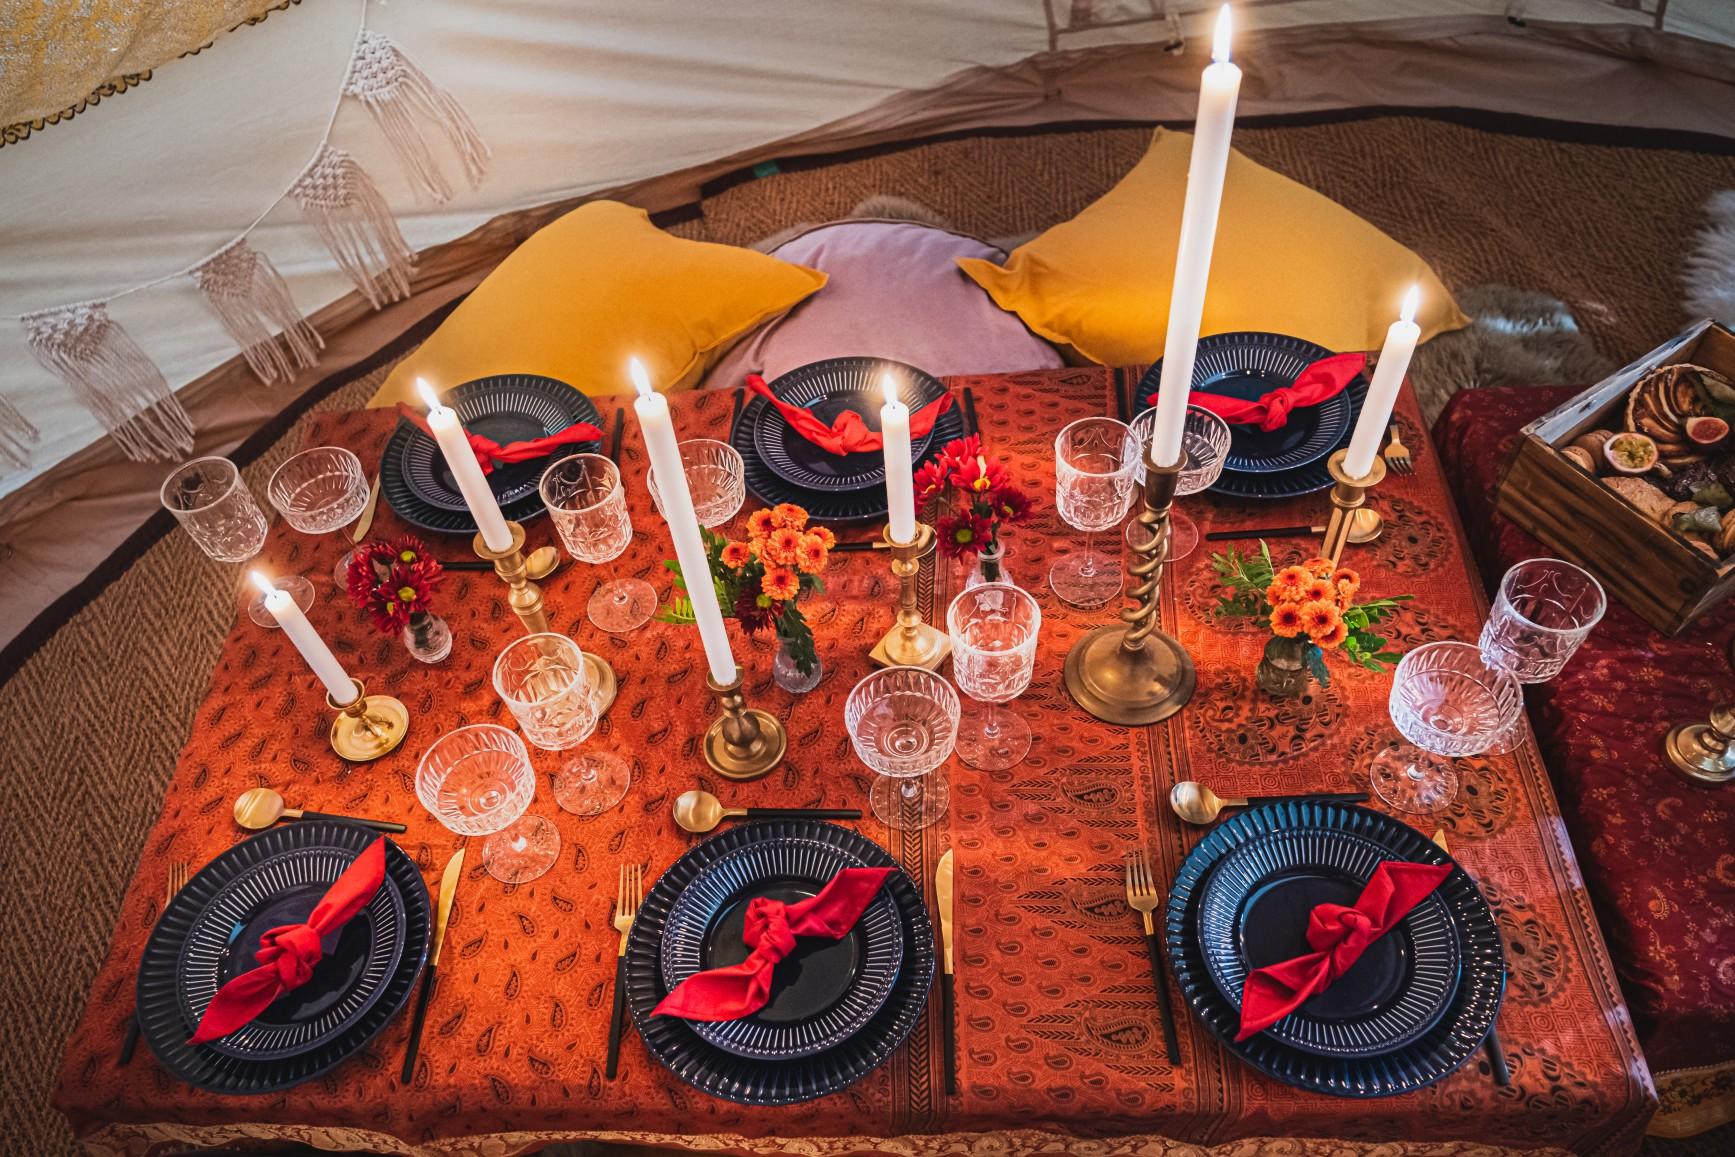 colourful micro wedding at patricks barn - wedding picnic - small wedding catering - boho wedding